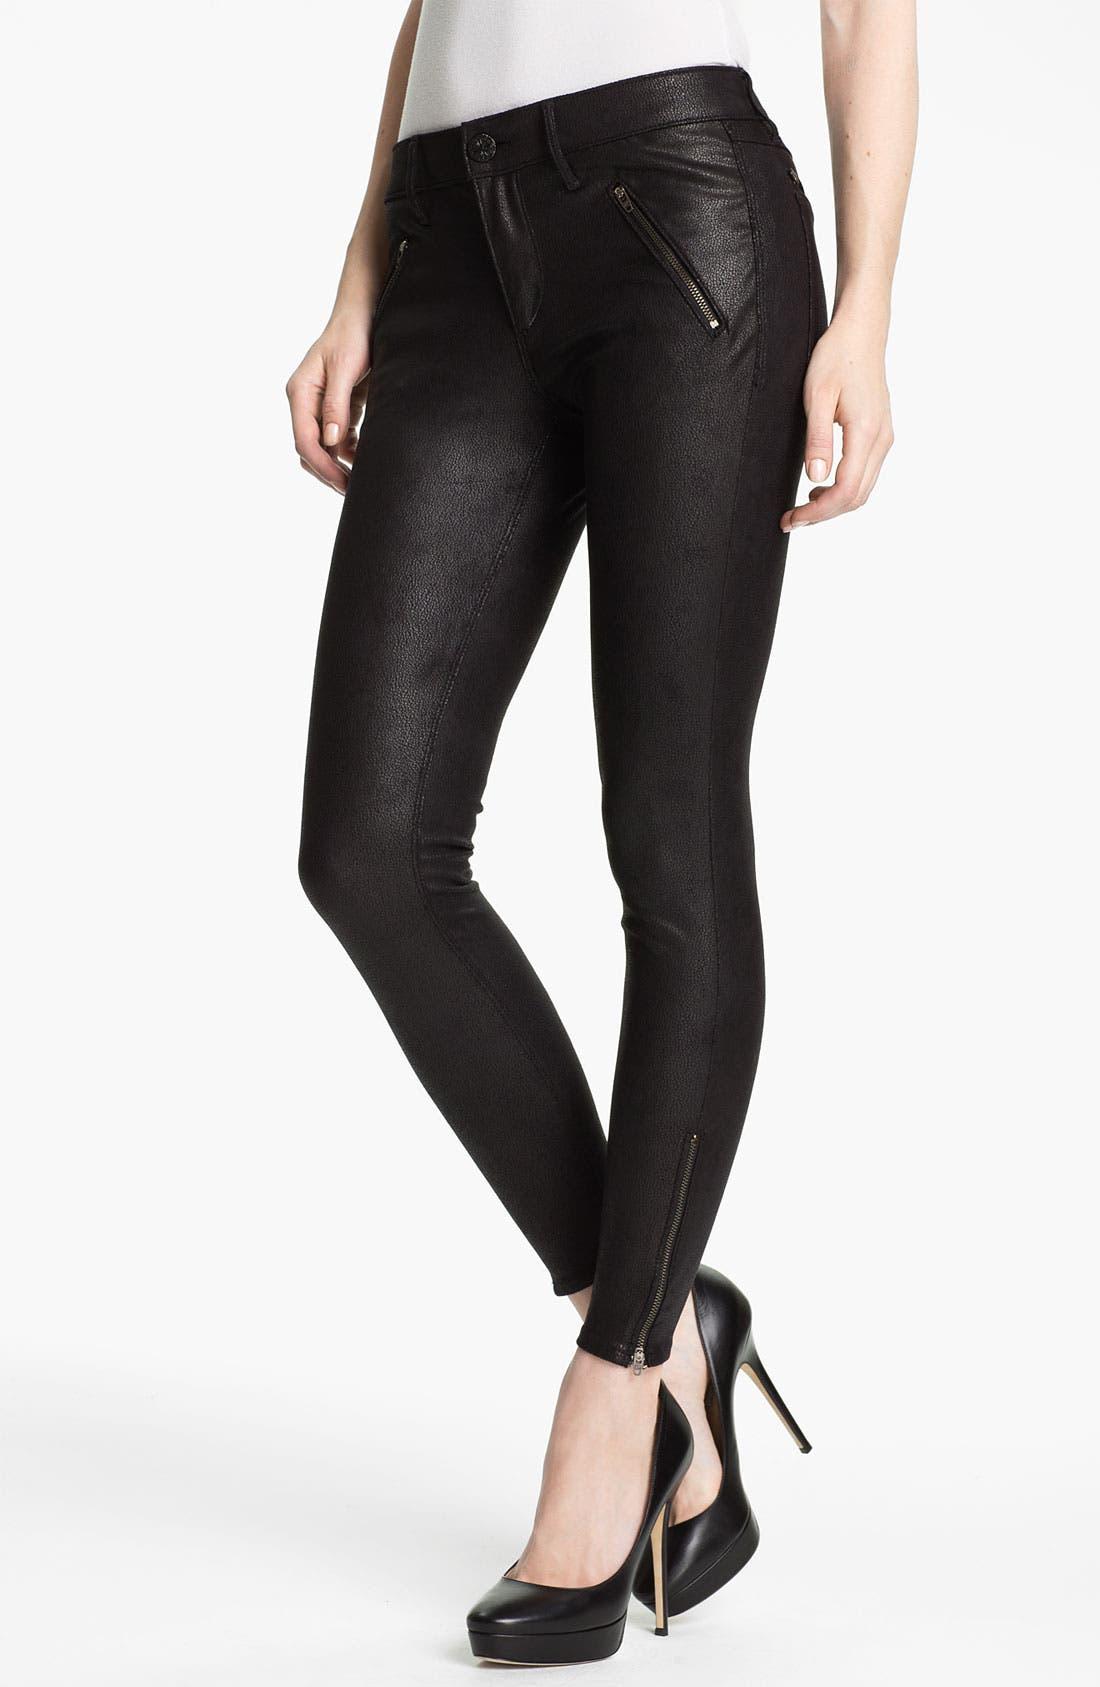 Alternate Image 1 Selected - Habitual 'Amalia' Skinny Coated Faux Leather Pants